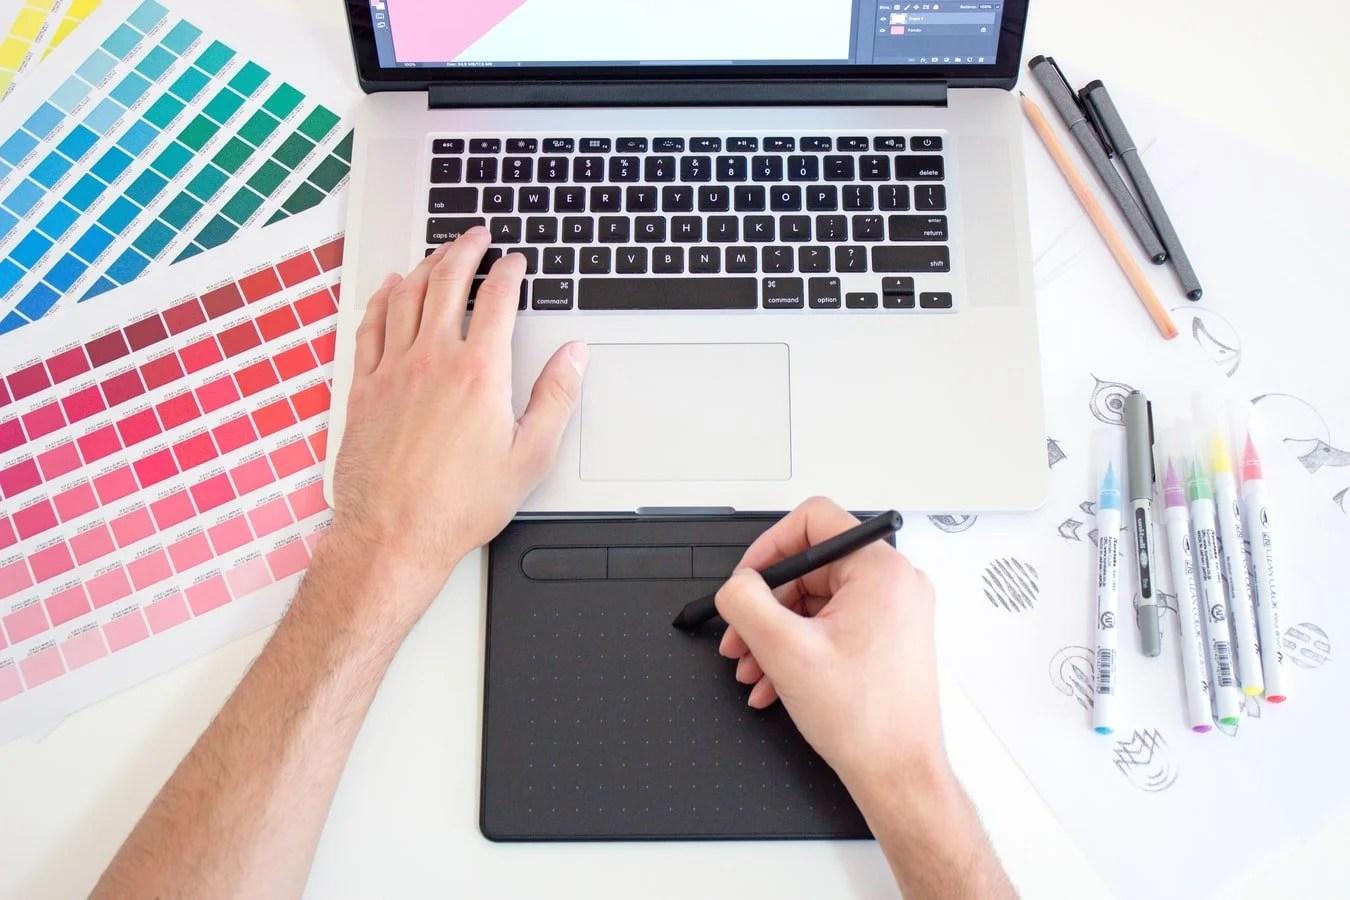 graphic designer hands on keyboard tool